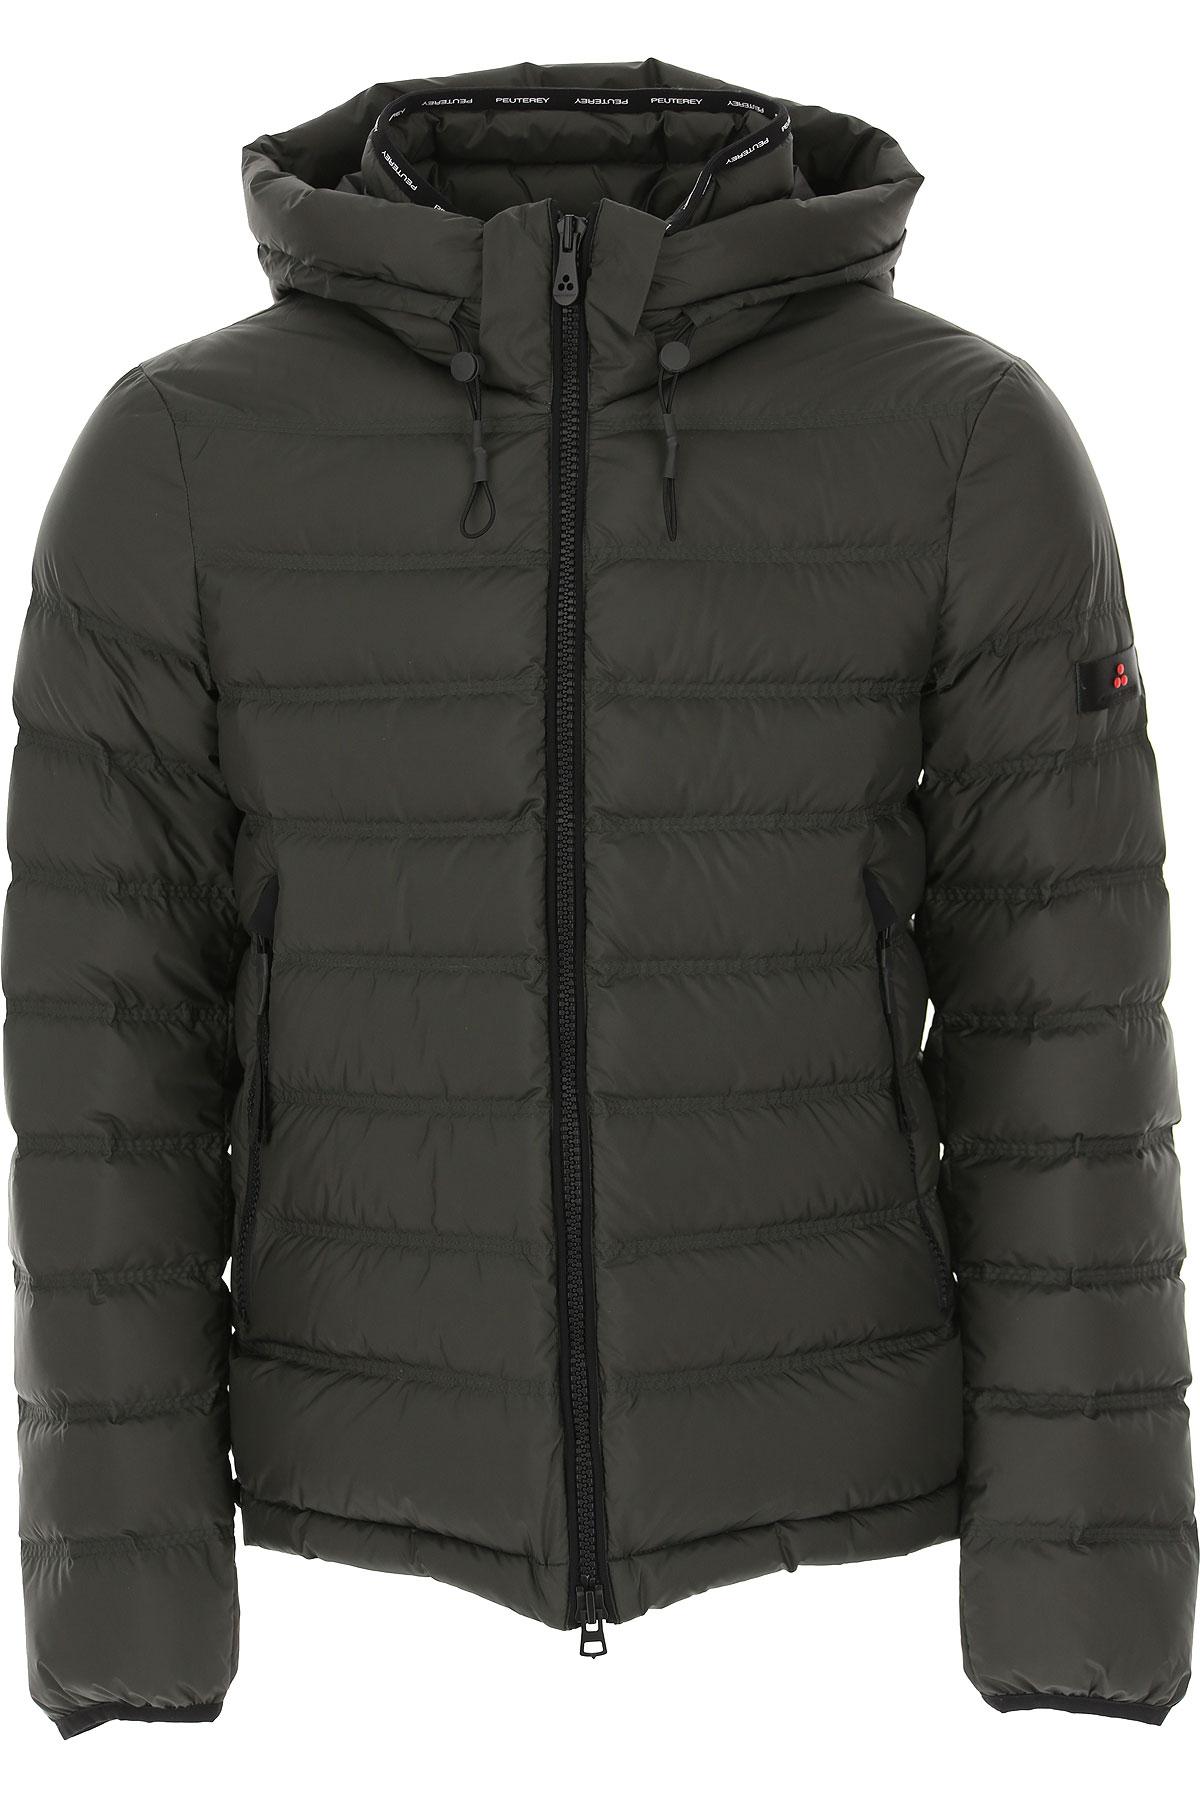 Peuterey Down Jacket for Men, Puffer Ski Jacket On Sale, Medium Grey, polyester, 2019, L S